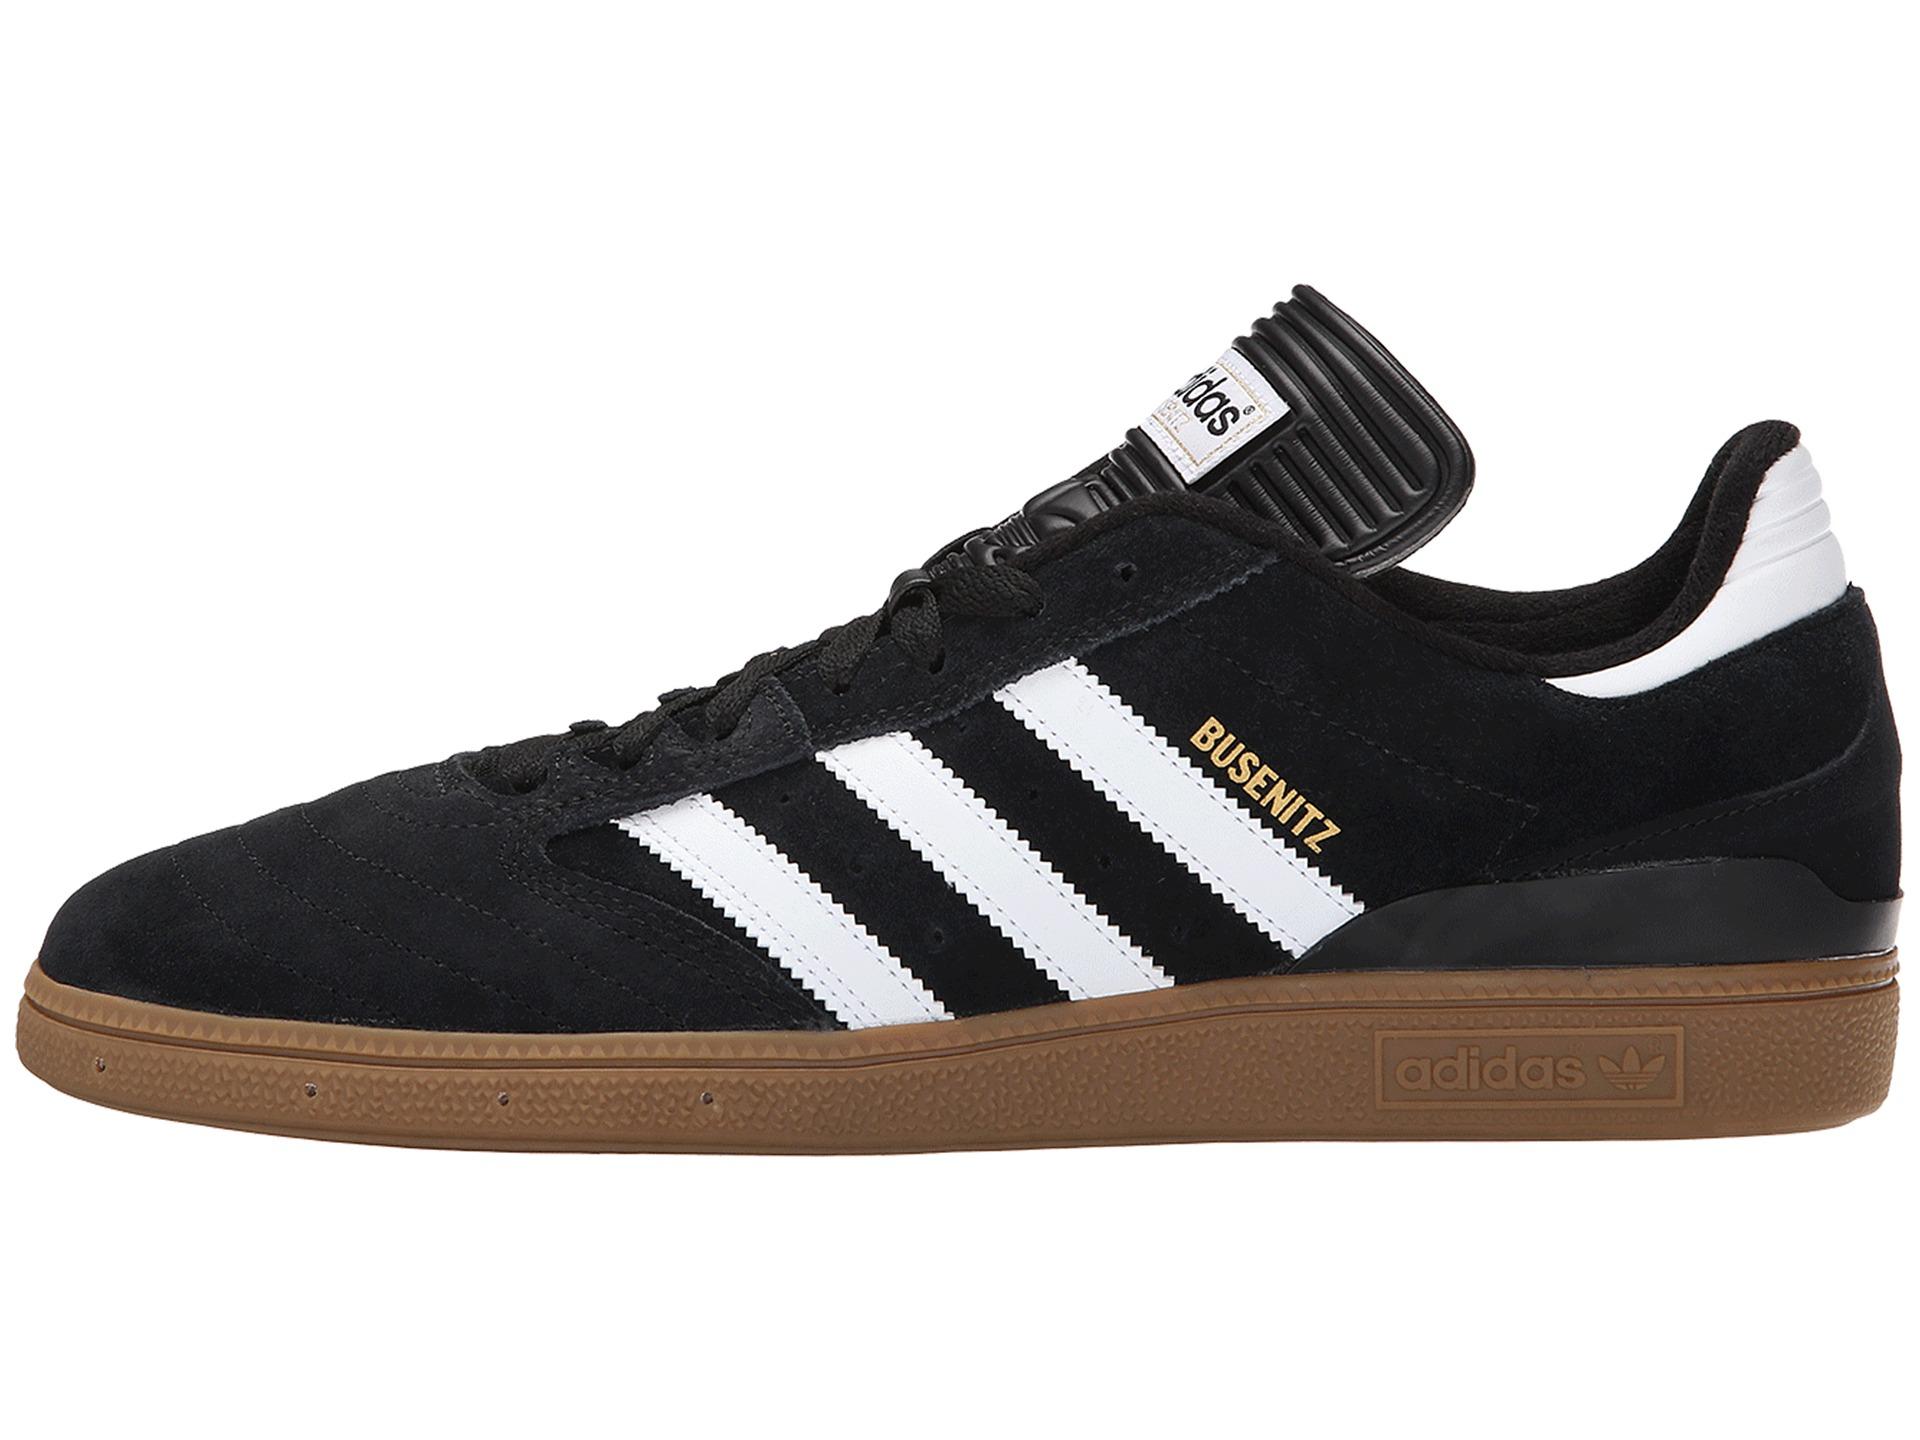 Adidas Skate Copa Shoes Review